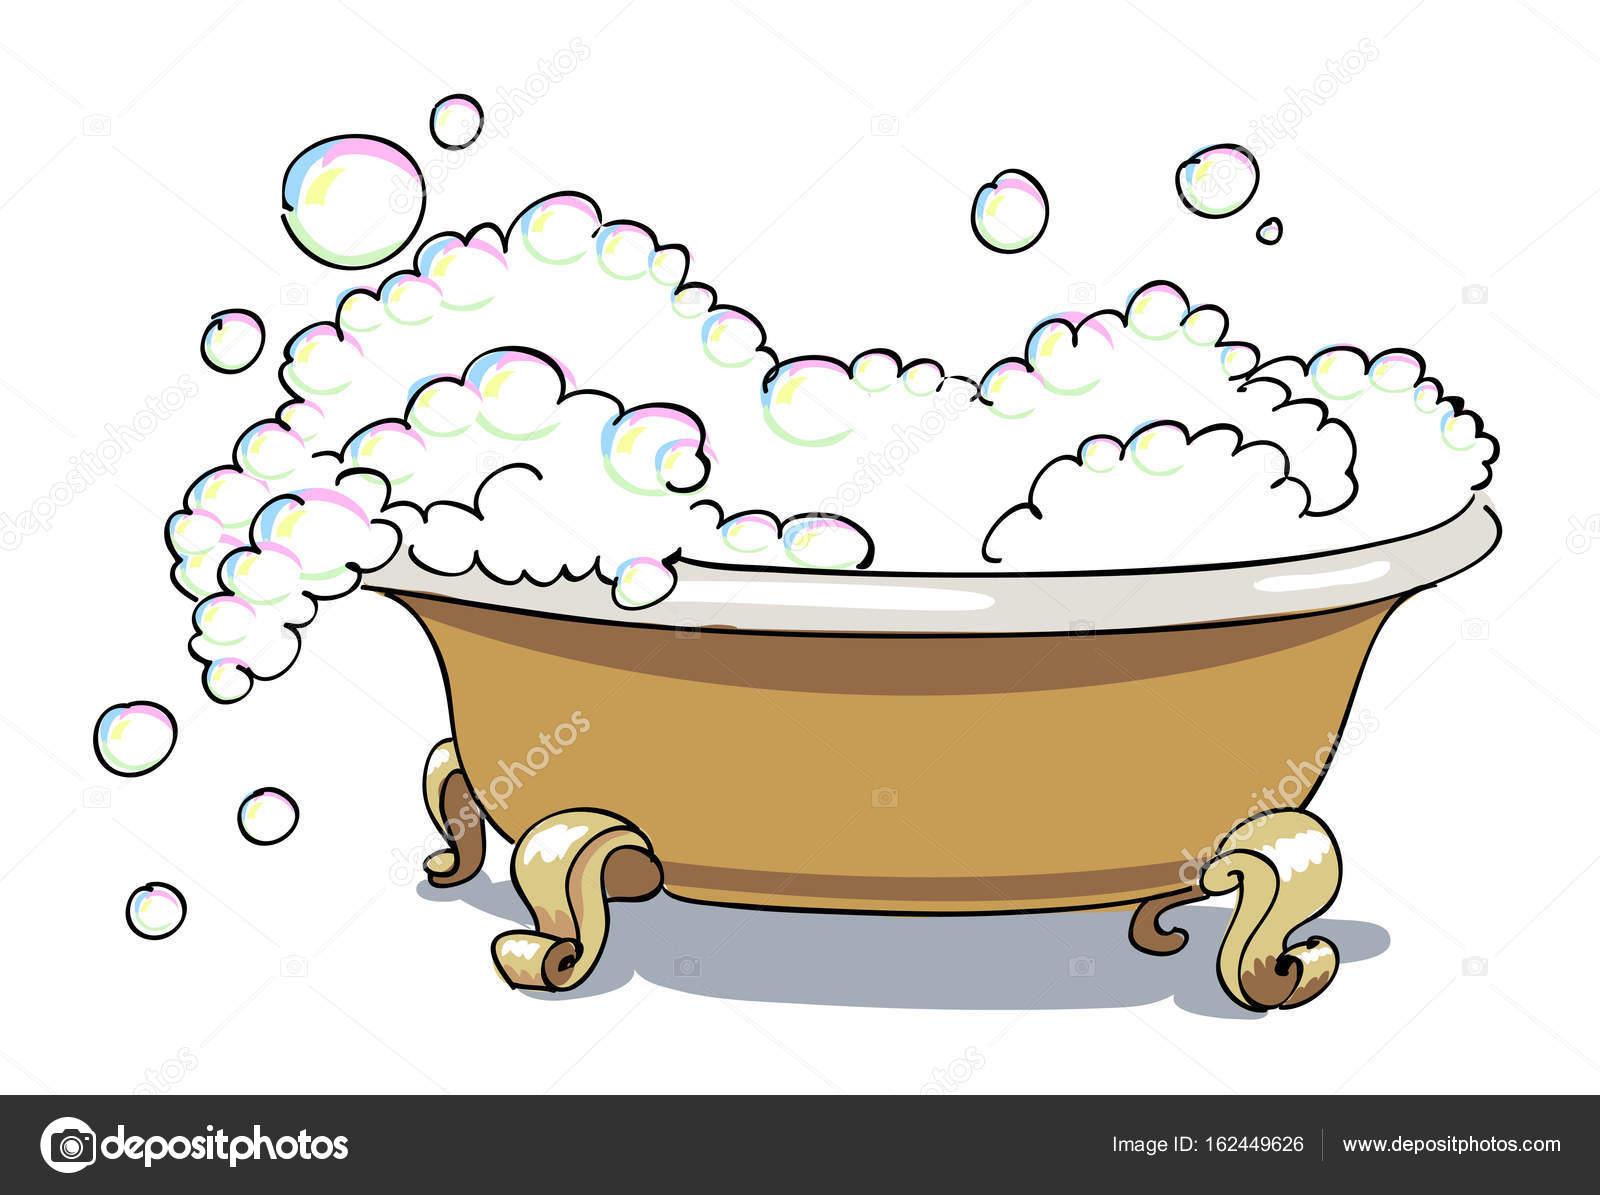 Comic bild der badewanne stockvektor lkeskinen0 162449626 - Badezimmer comic ...